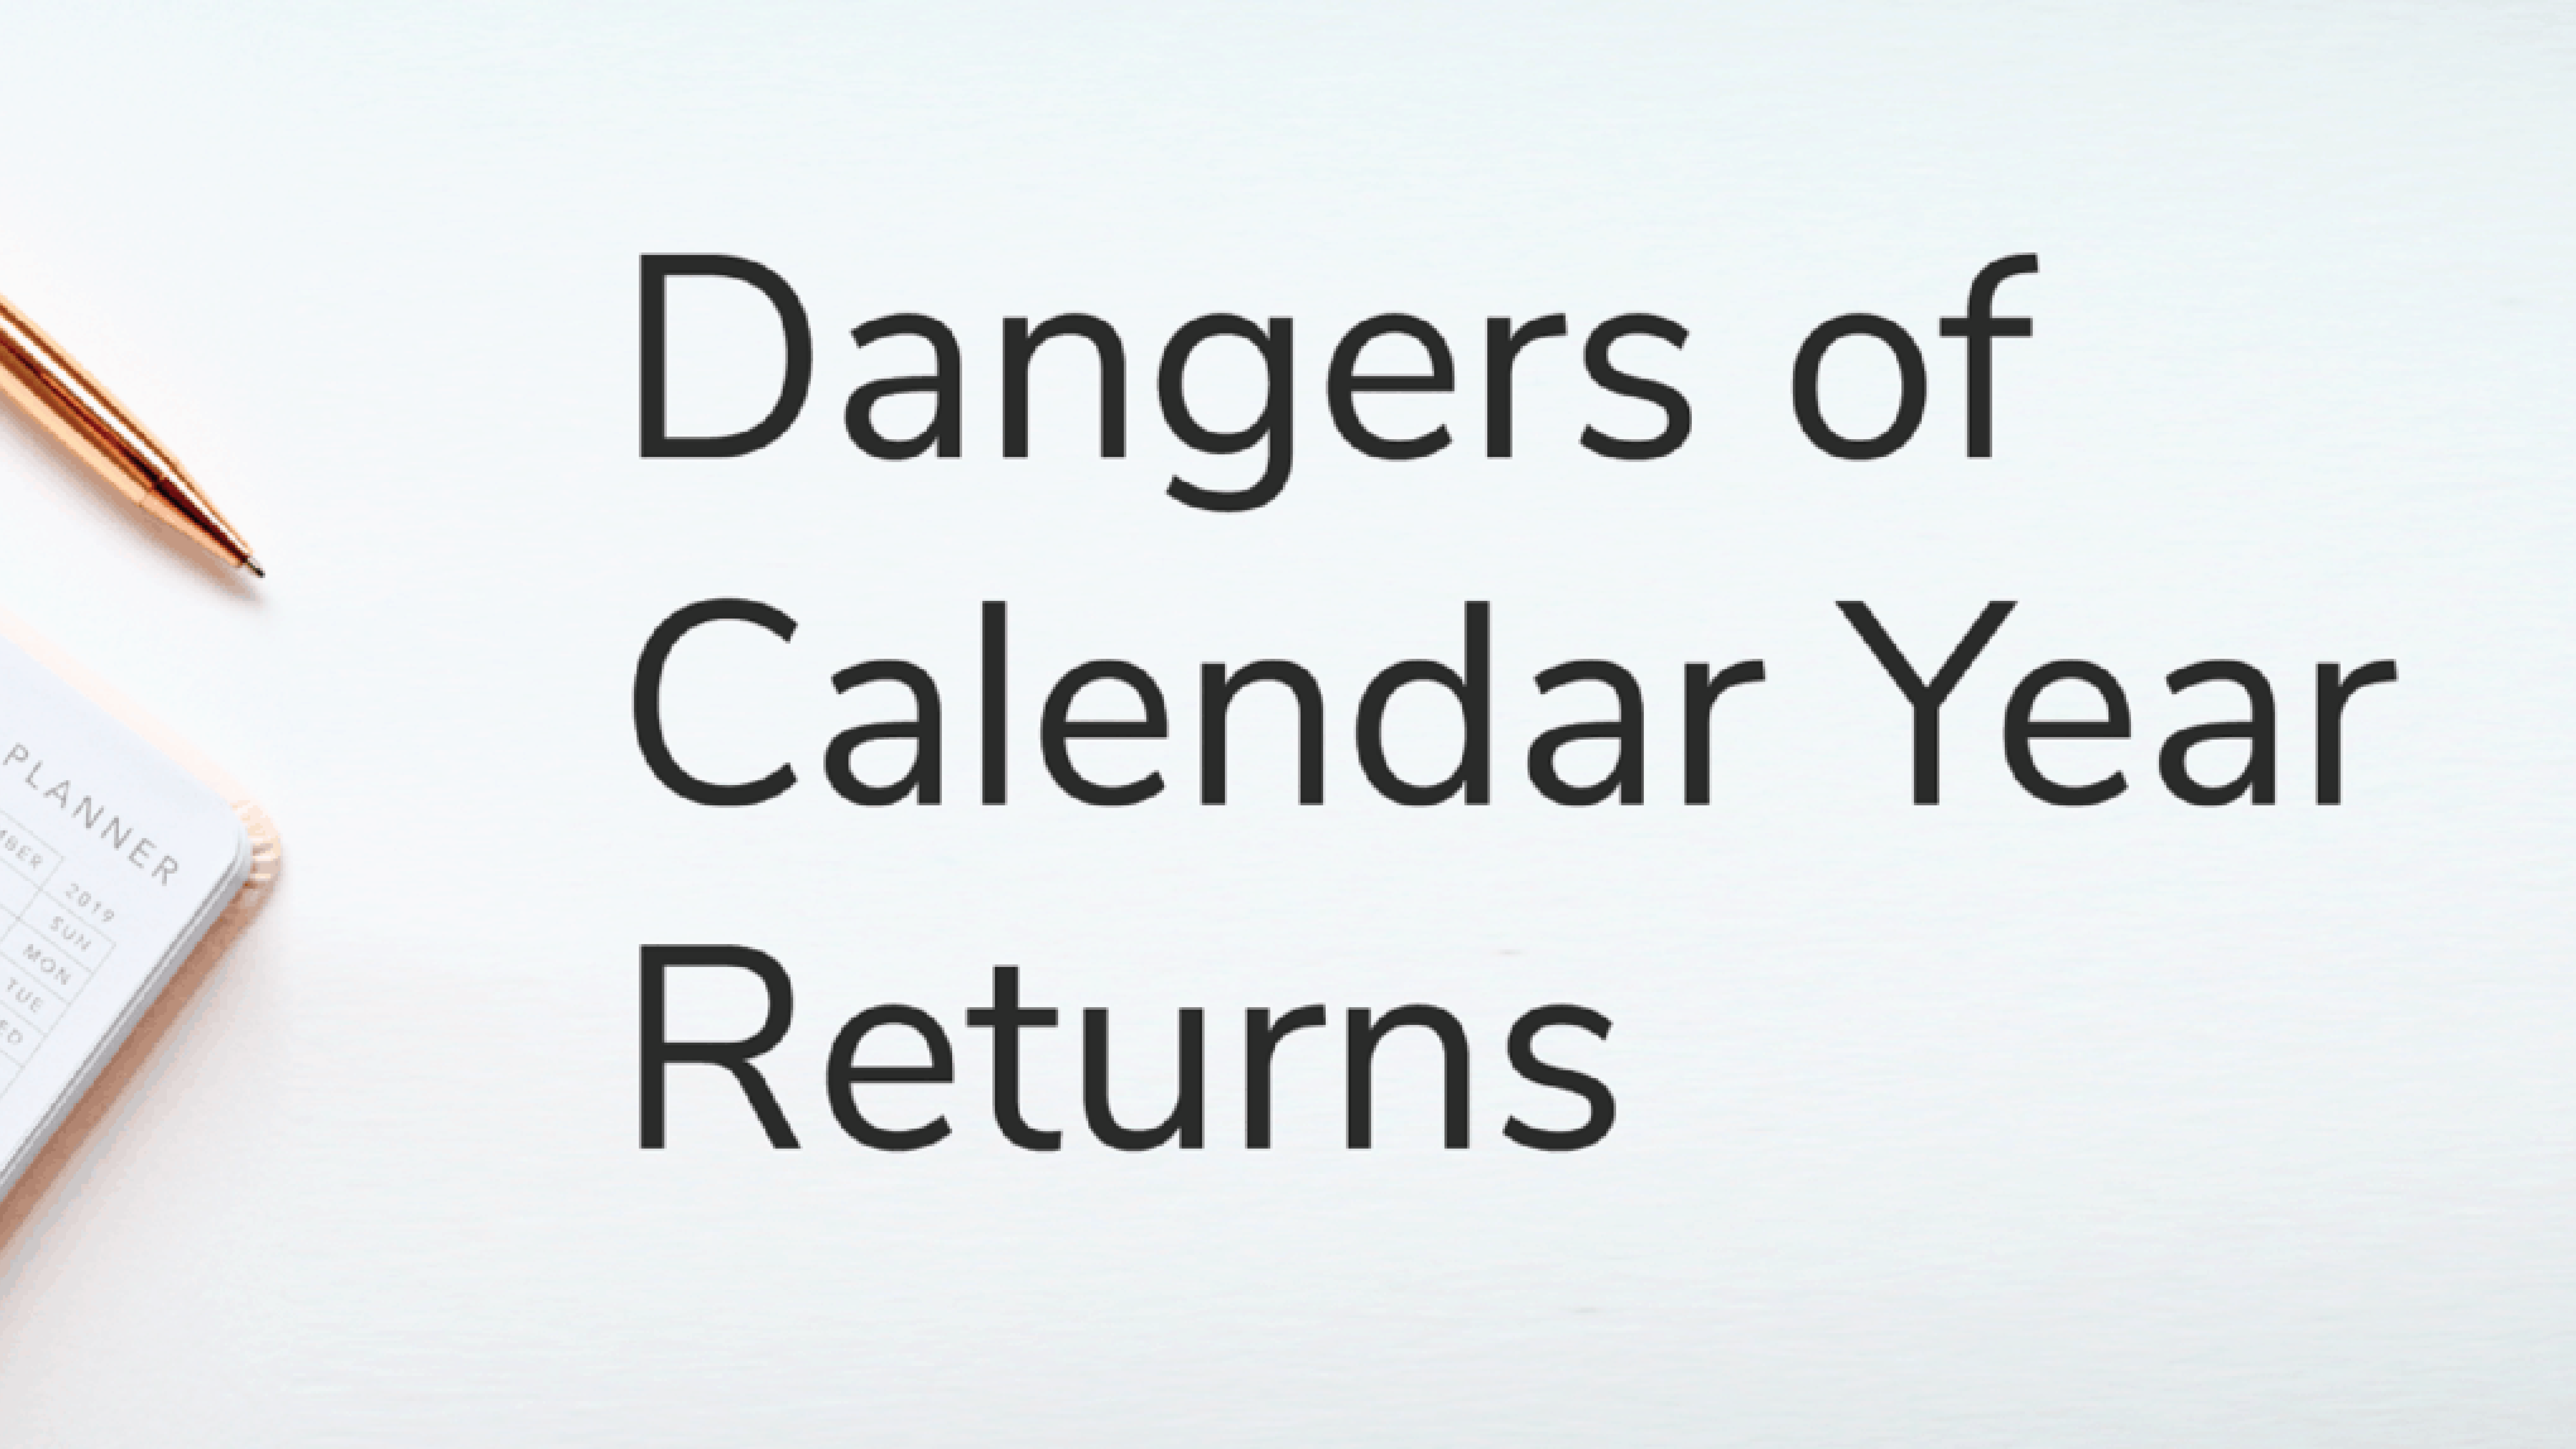 Dangers of Calendar Year Returns